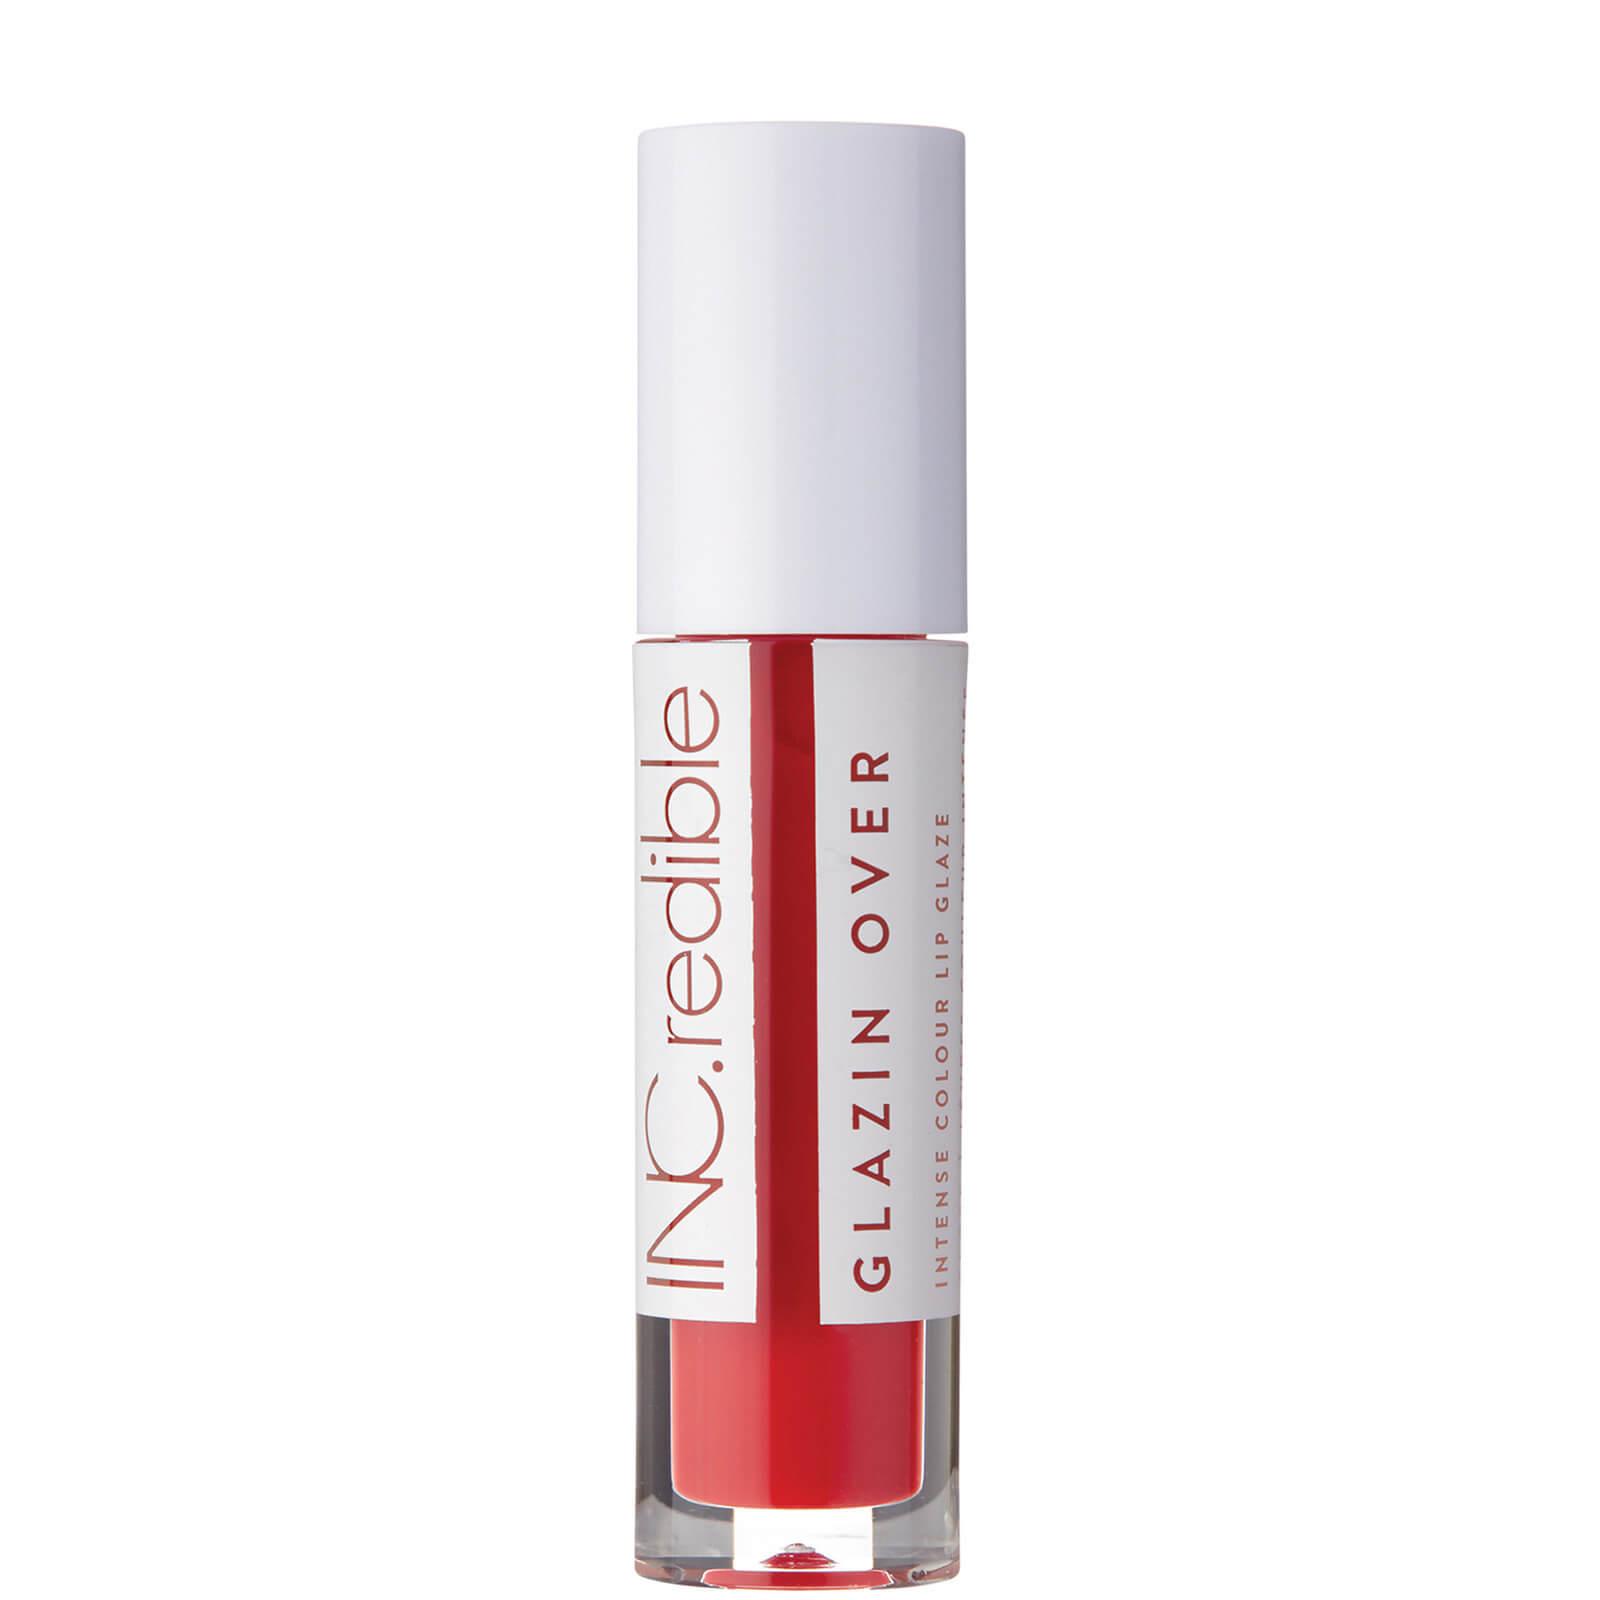 INC.redible Glazin Over gloss labbra (varie tonalità) - Vibes Tribe